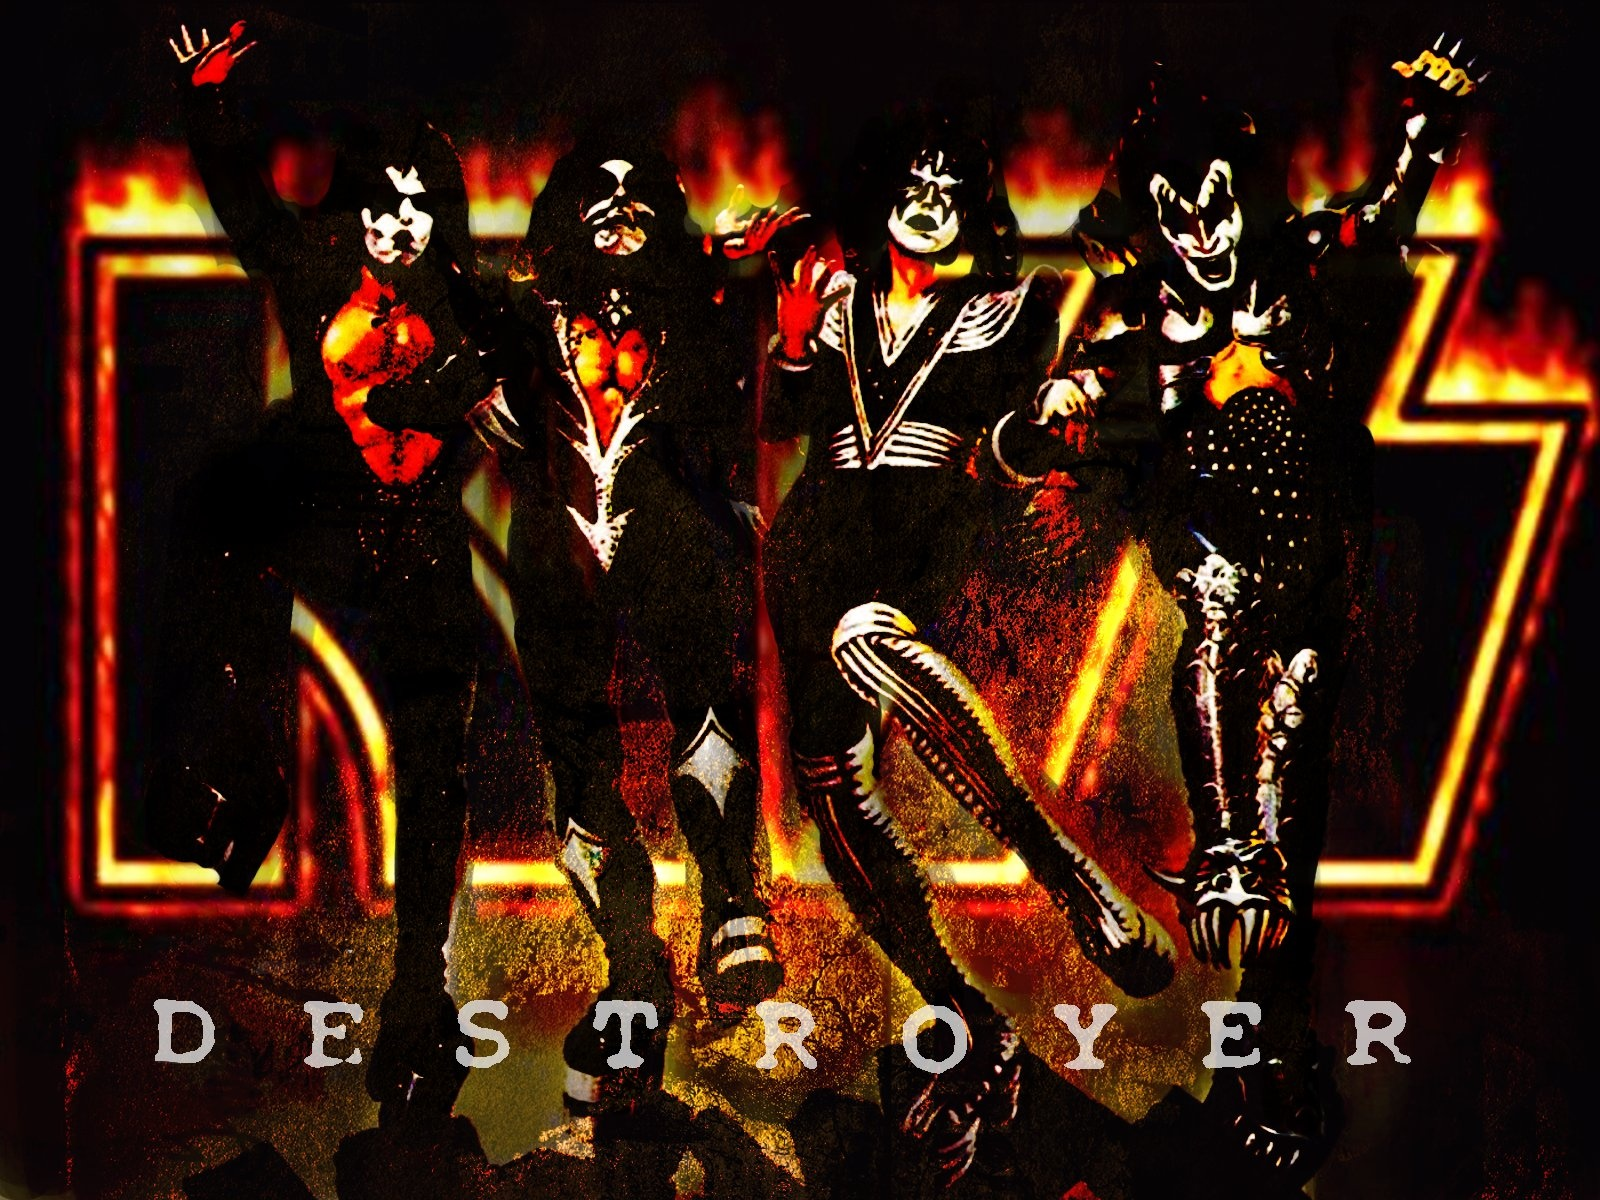 43] Rock Band Kiss Wallpapers on WallpaperSafari 1600x1200